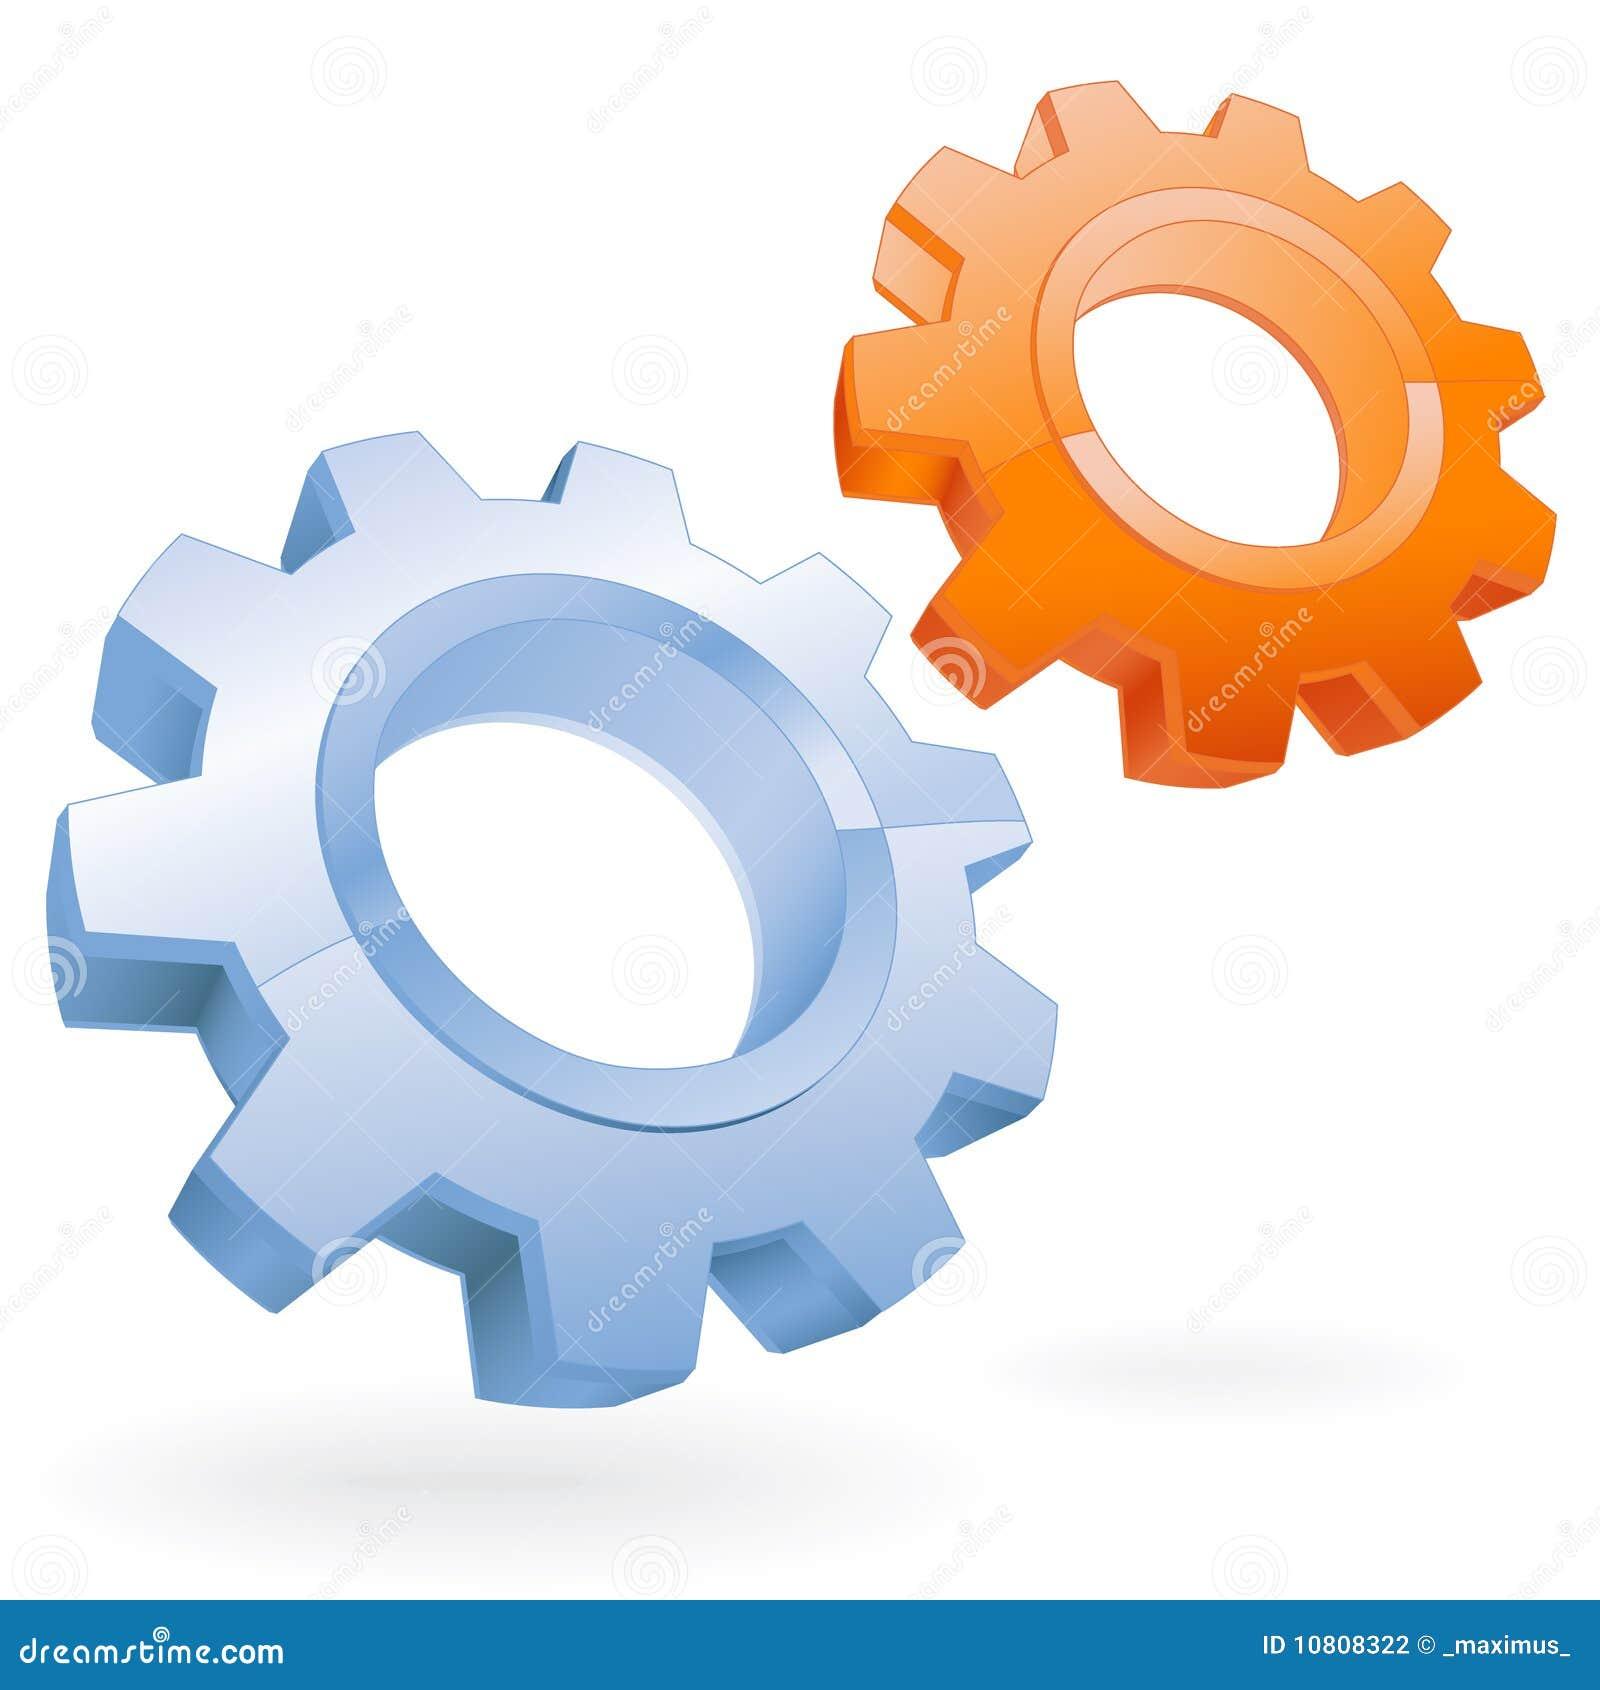 Gear vector icon stock vector. Illustration of internet ...